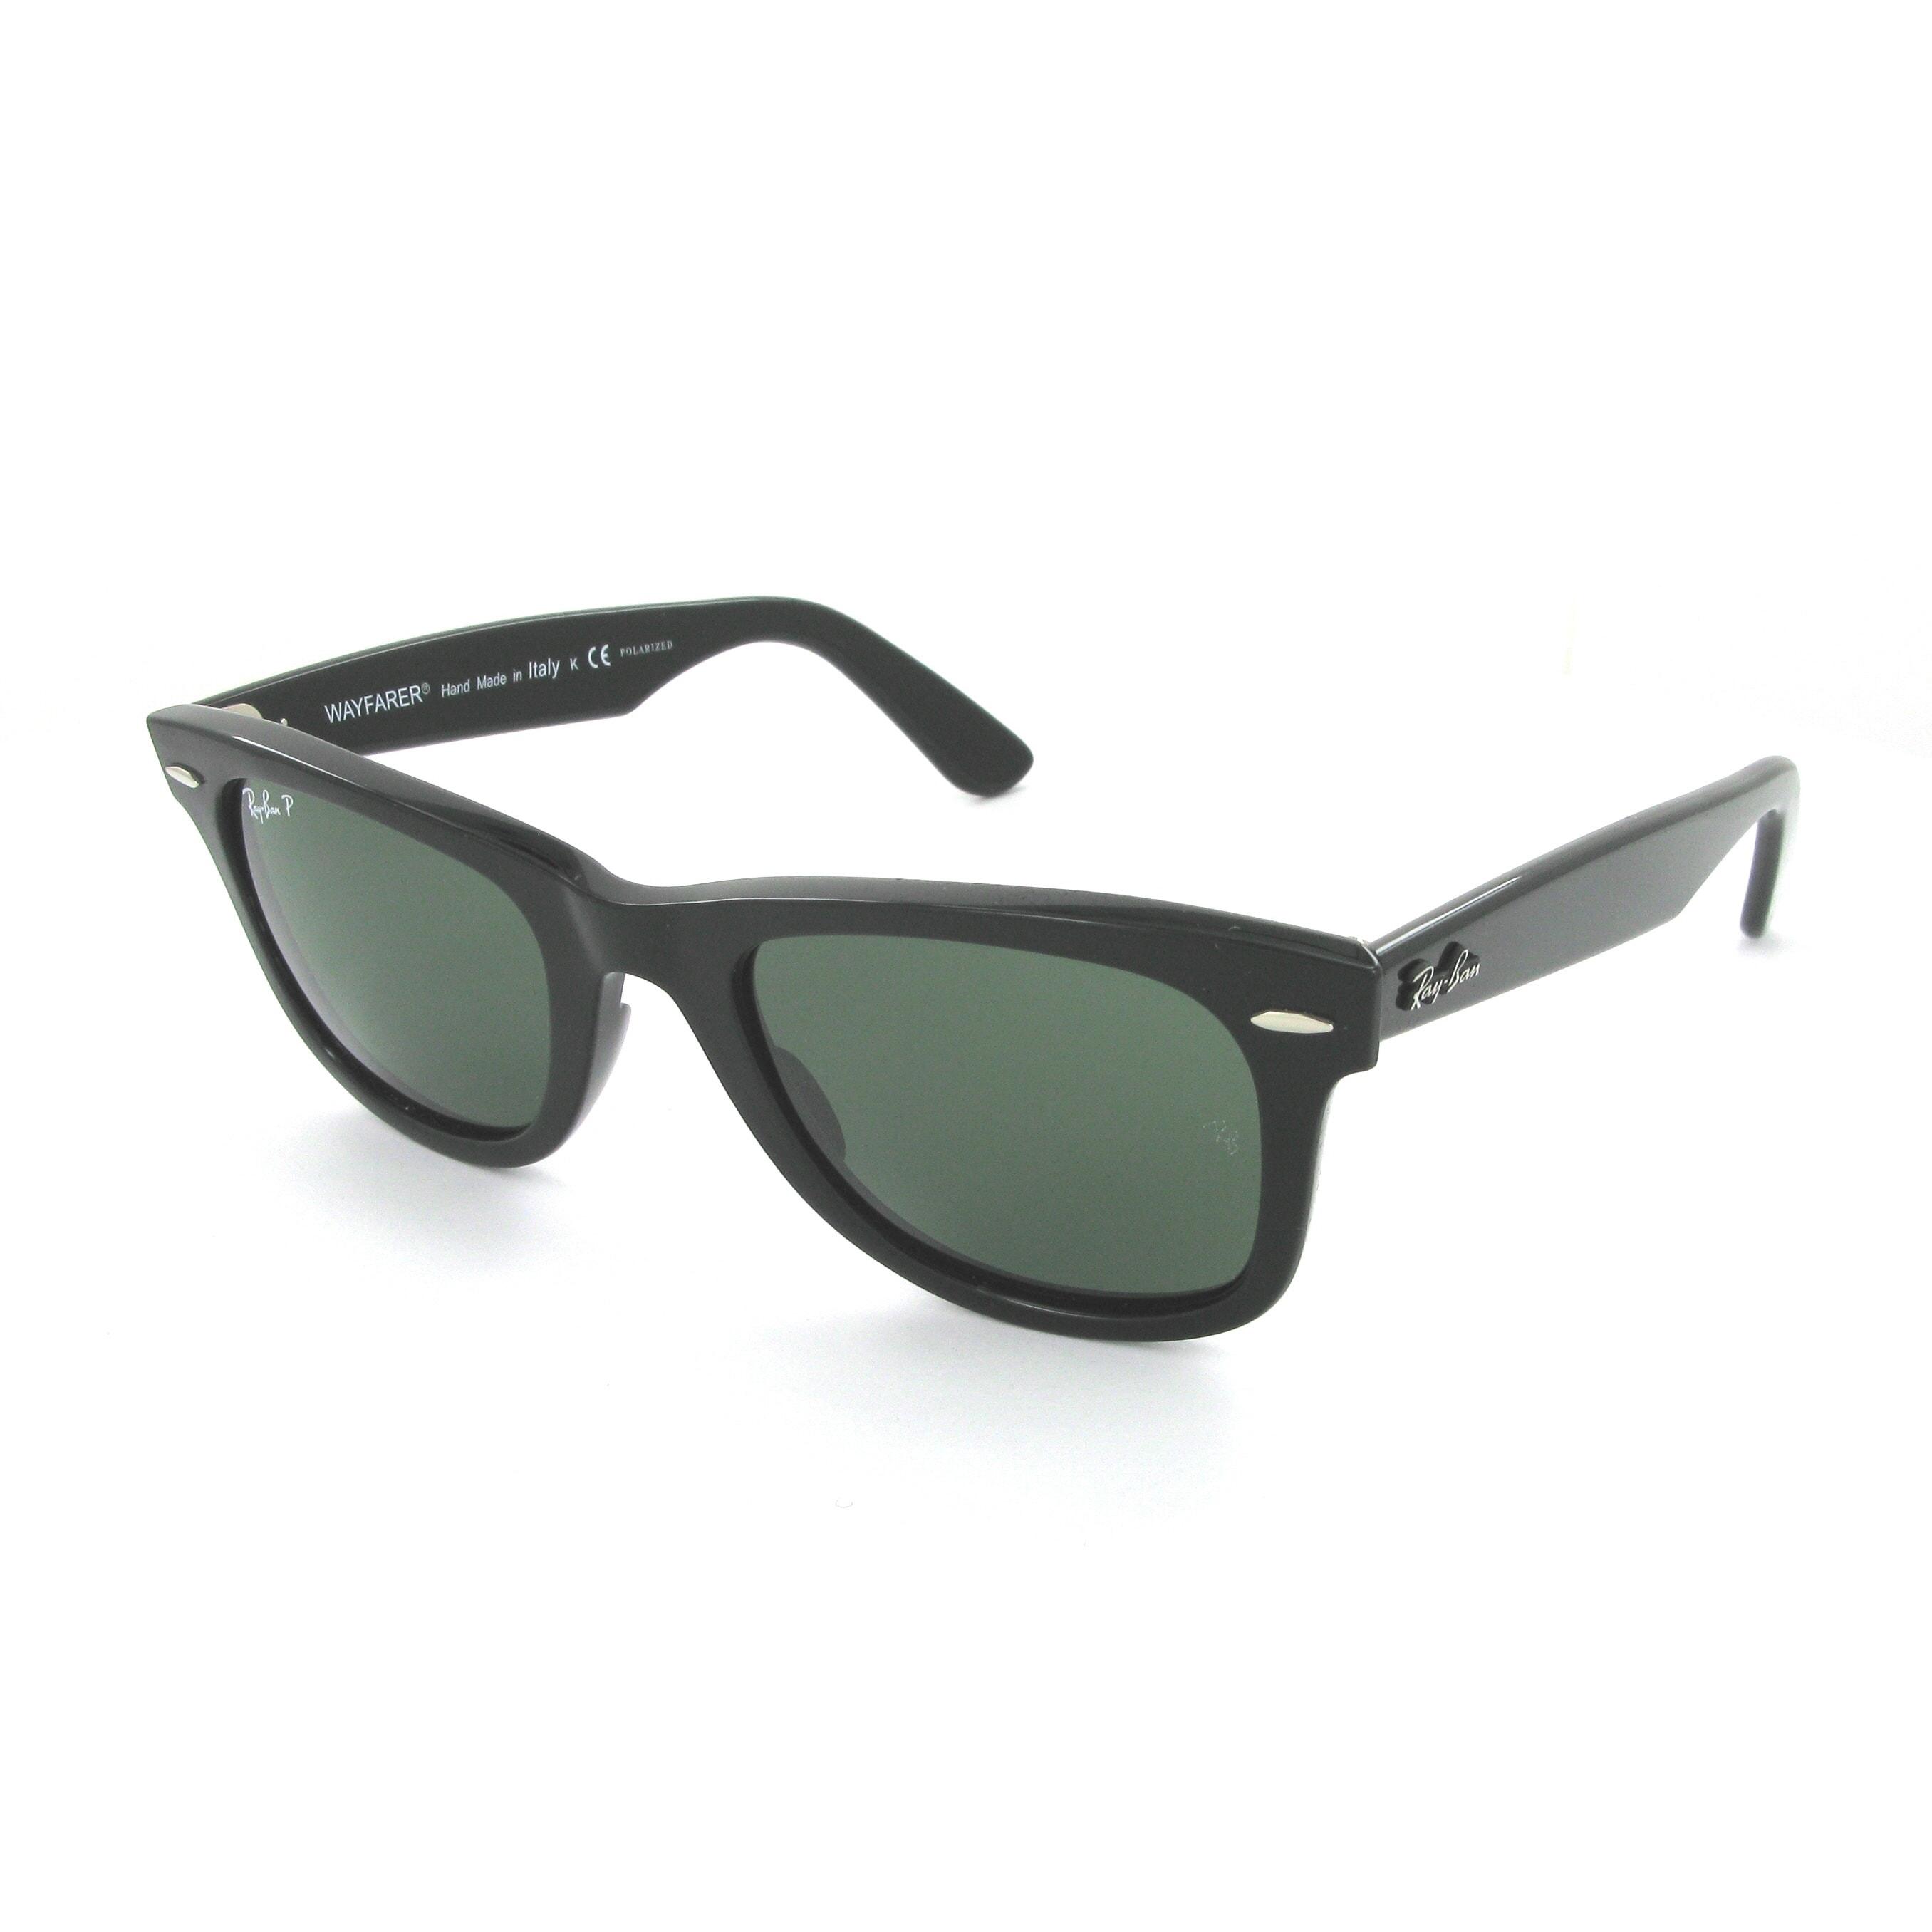 Rayban 2140 90158 52mm Wayfarer Polarized Sunglasses